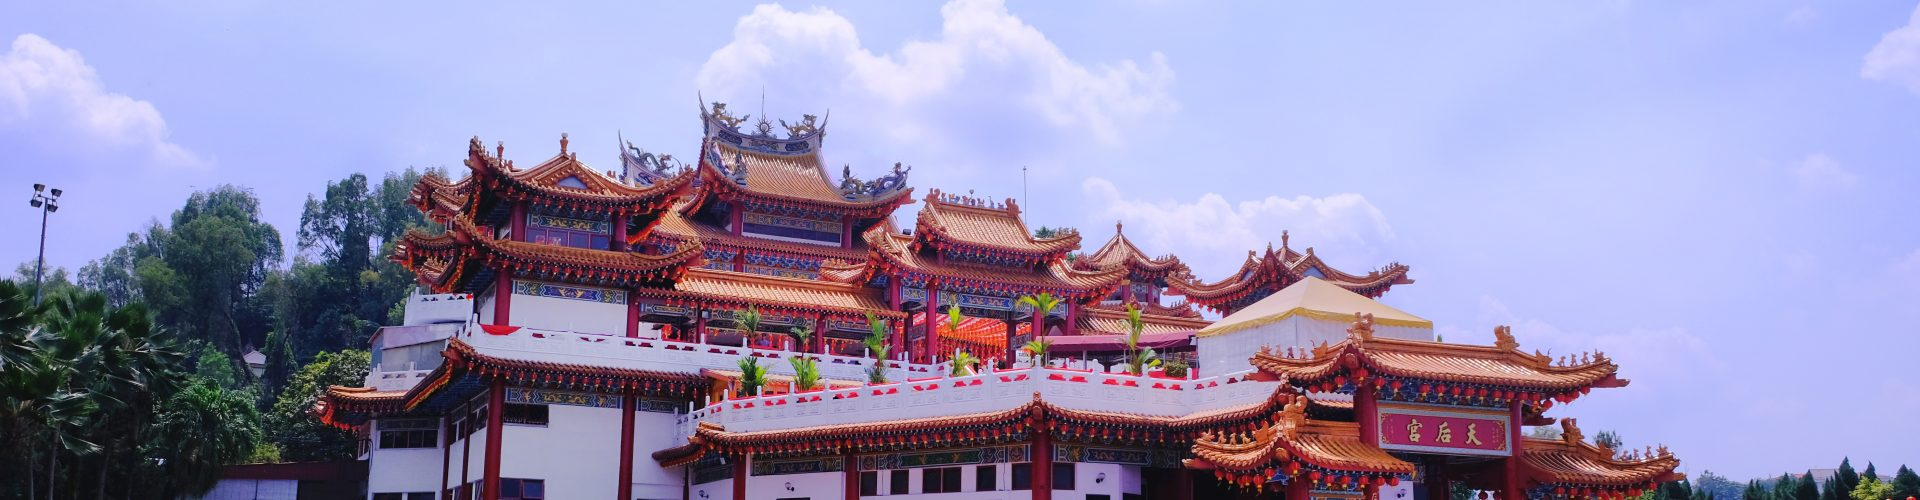 Храм Тянь Хоу (Tokong Thean Hou) Куала-Лумпур